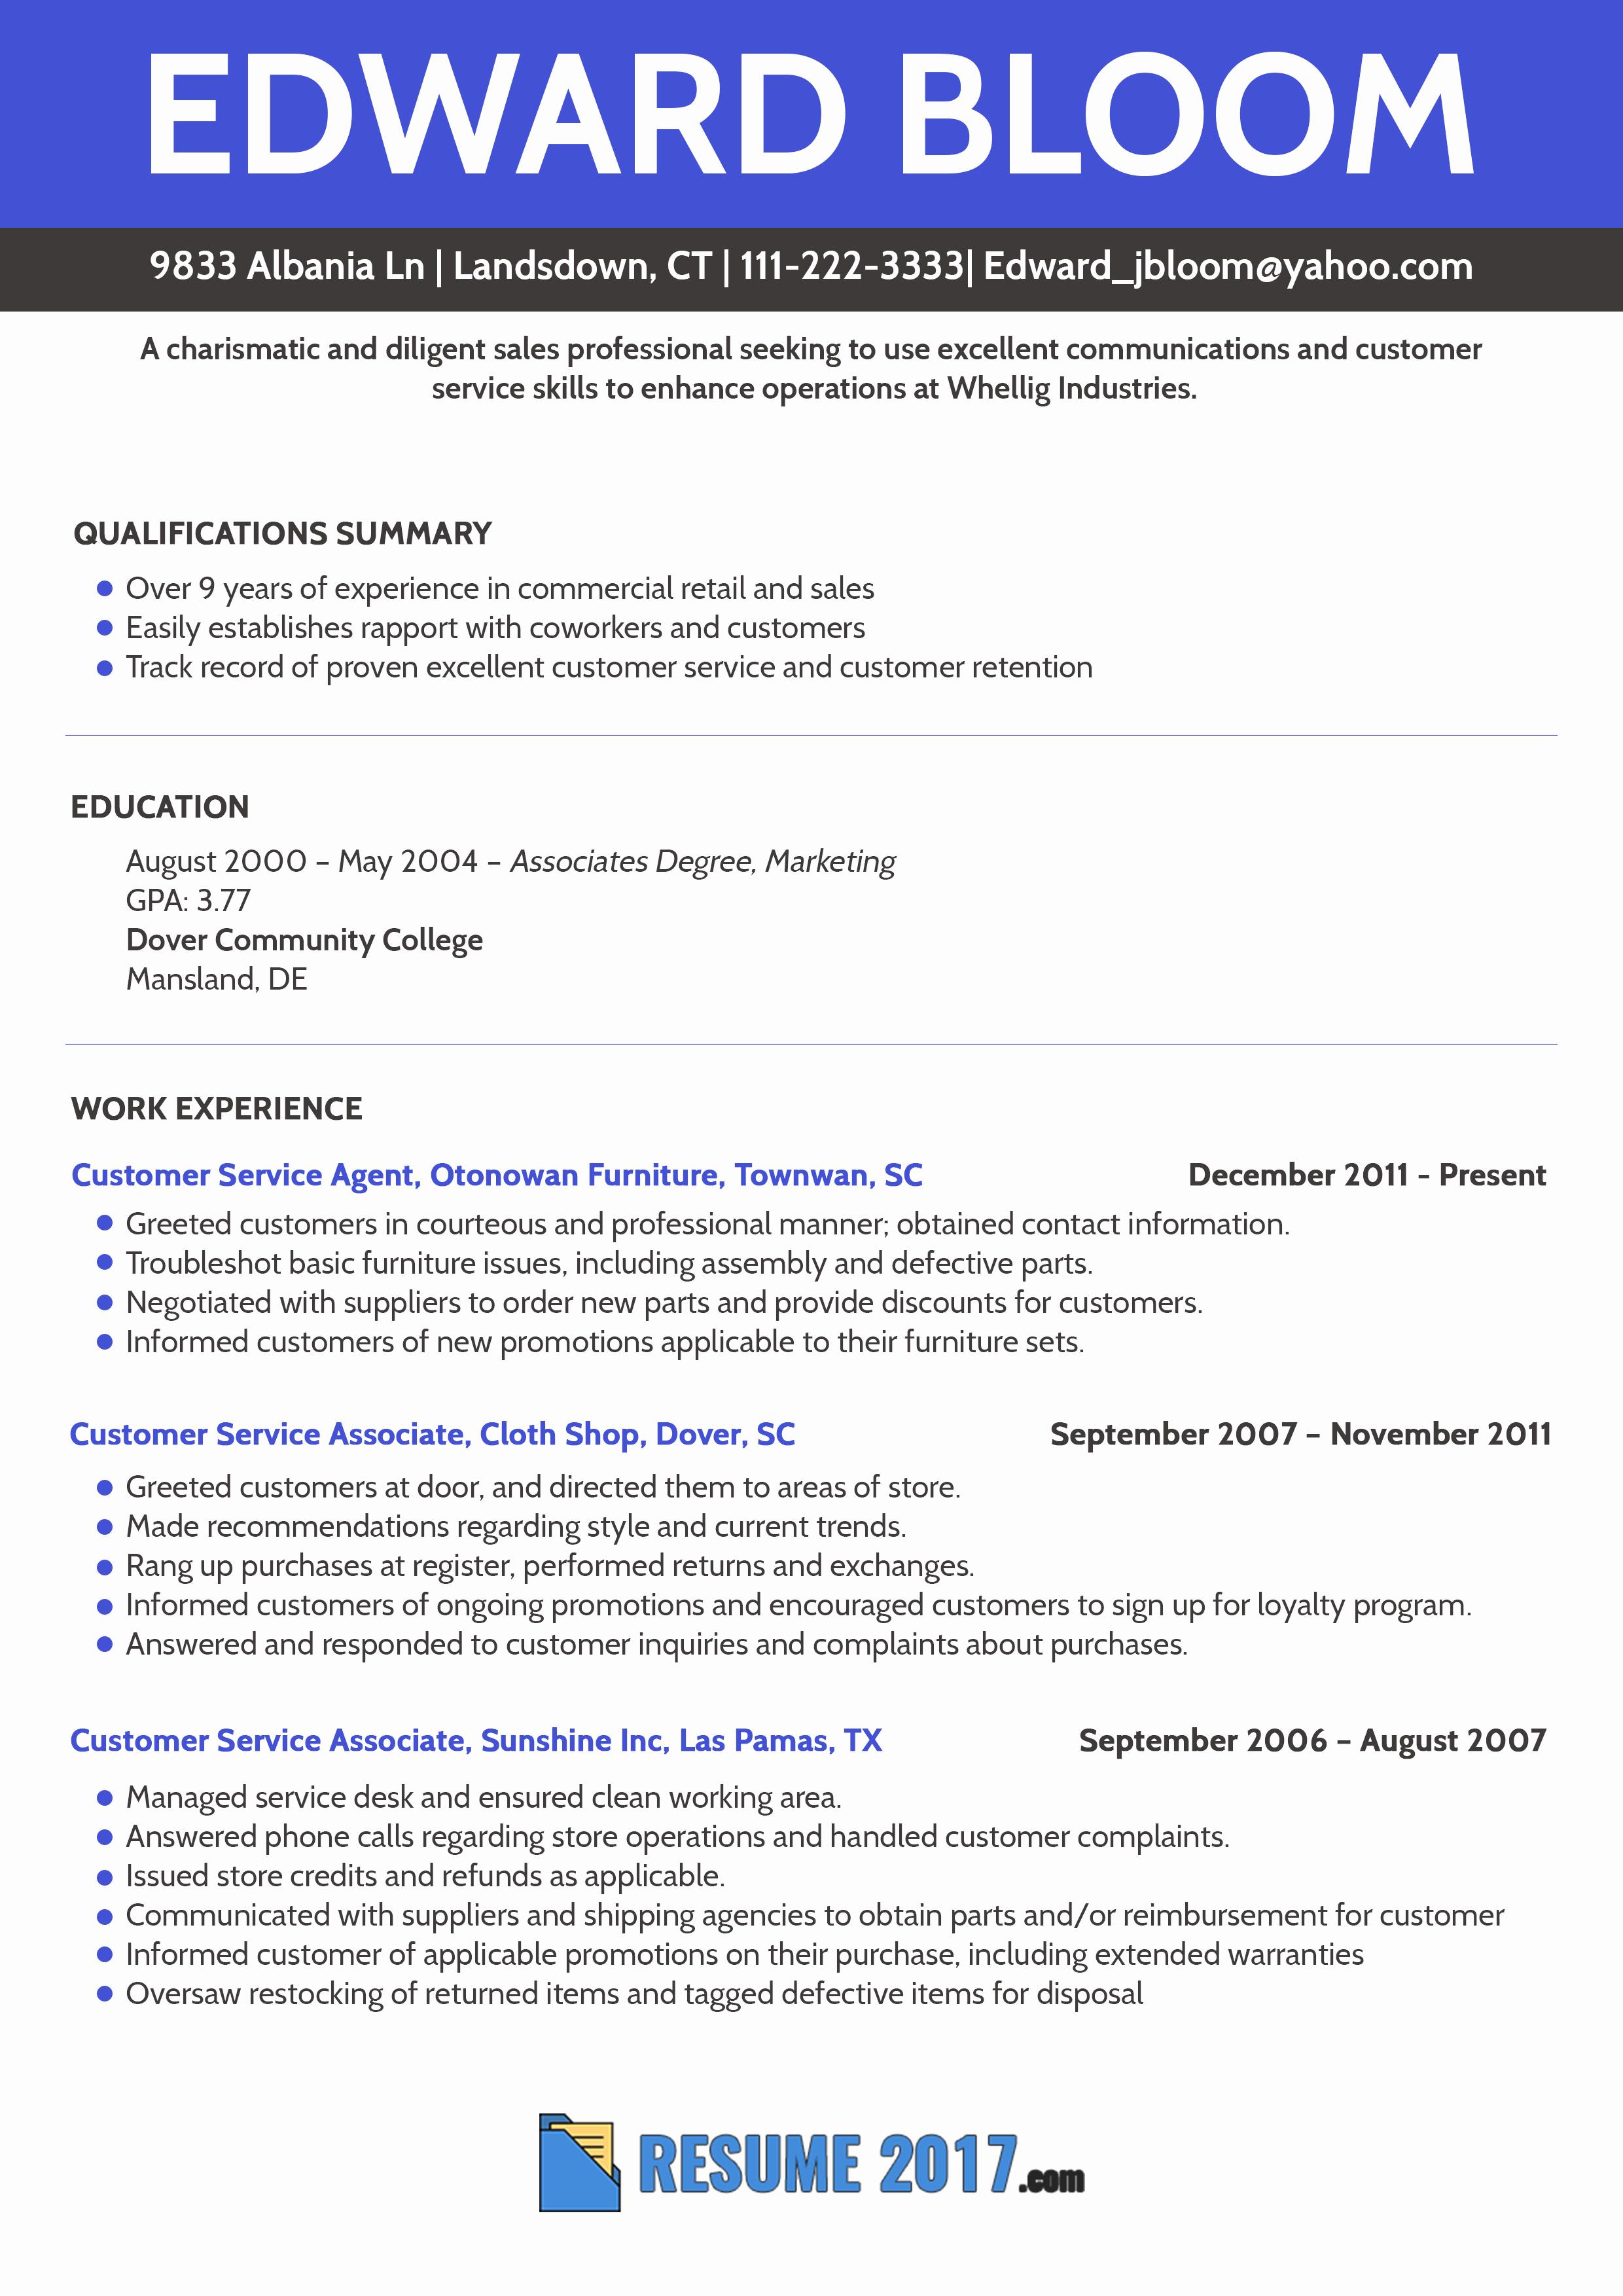 Resume Format Trends 2018